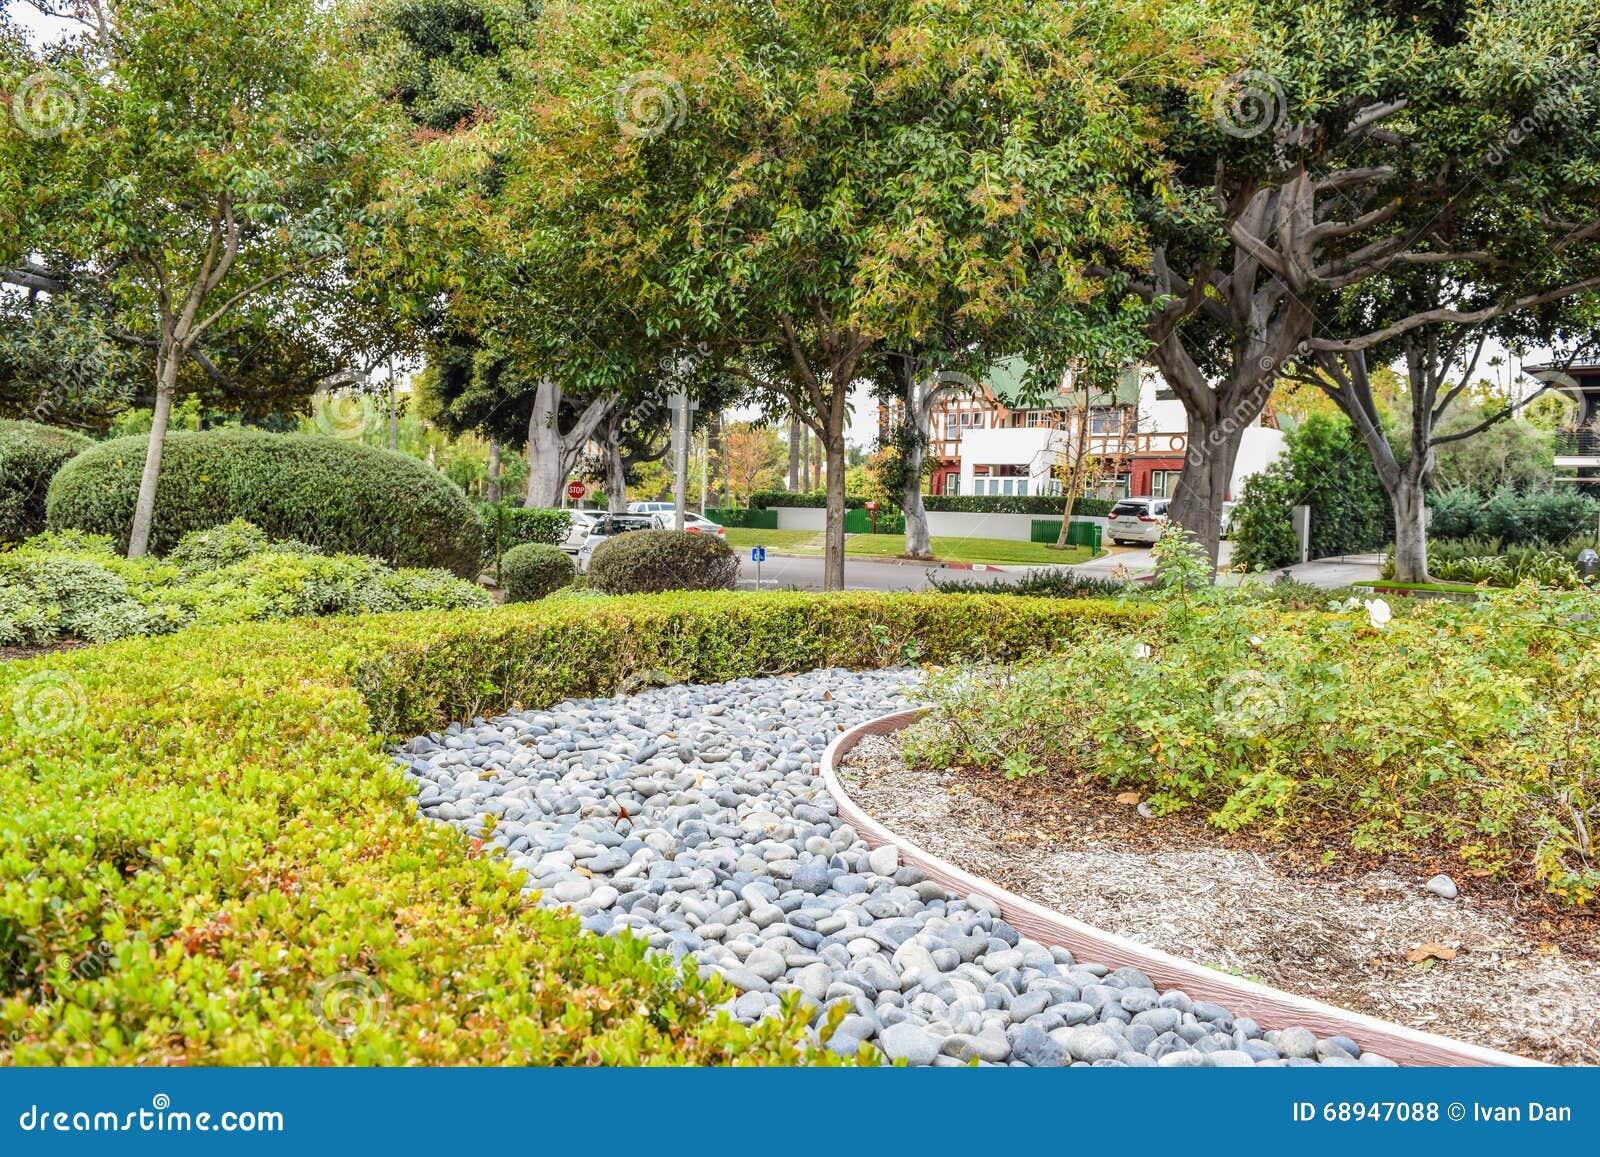 Diseo de paisajes y jardines excellent jardineria - Paisajes de jardines ...